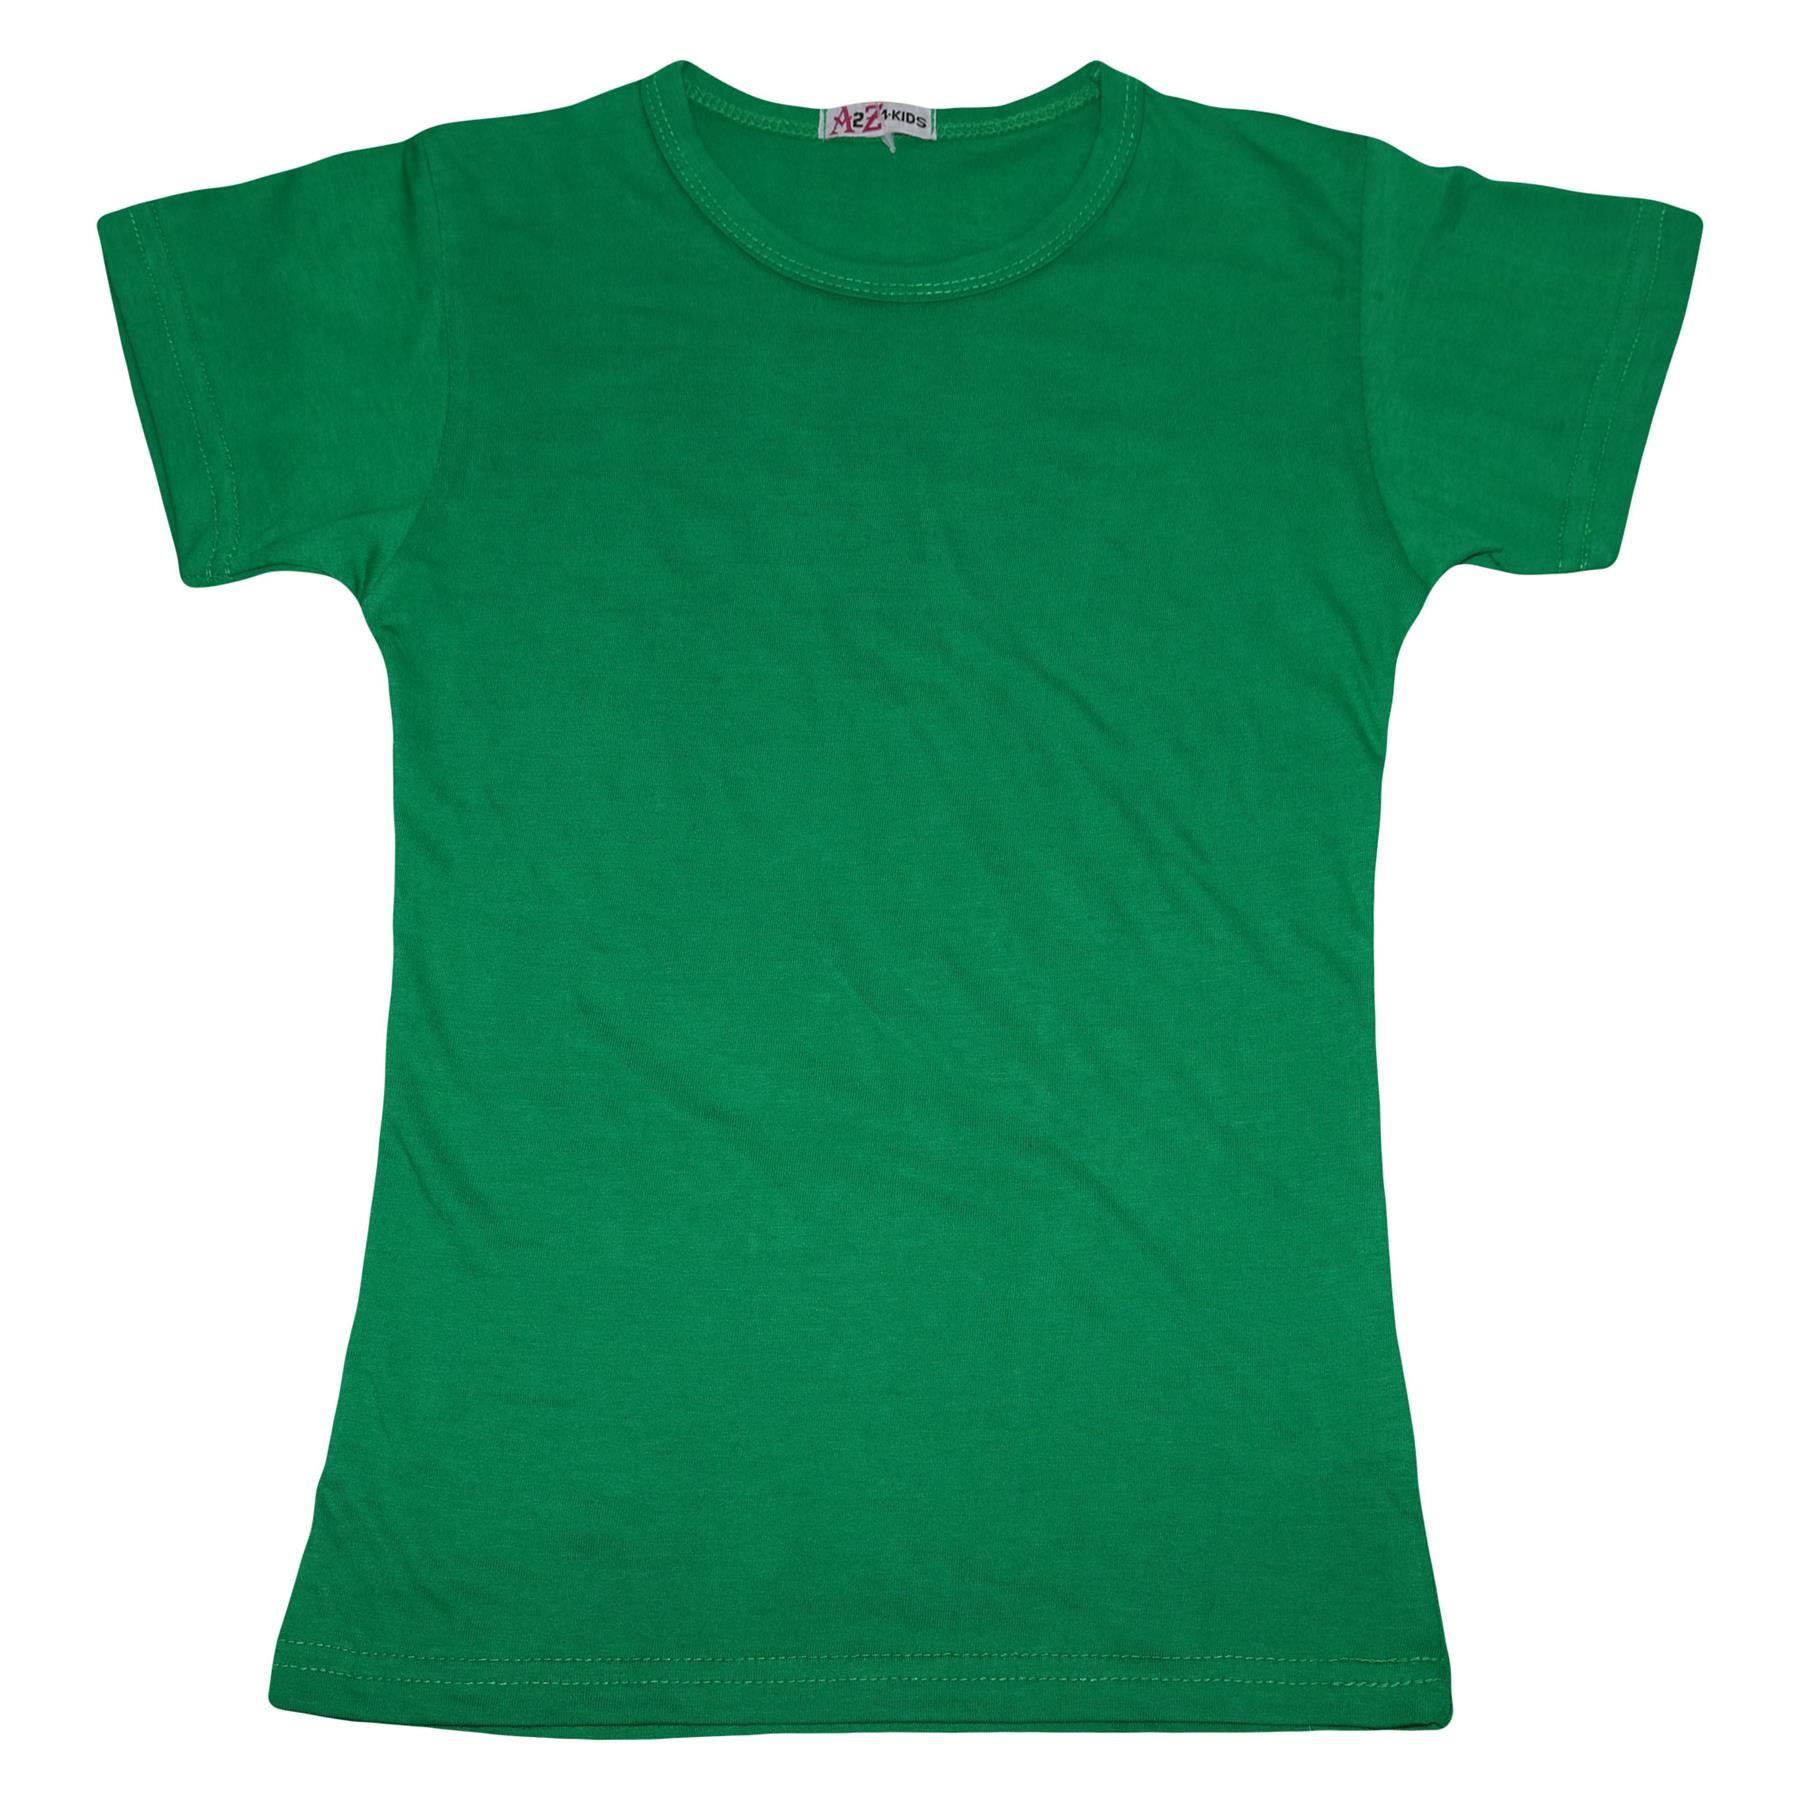 Kids-Girls-T-Shirts-Designer-100-Cotton-Plain-School-T-Shirt-Top-New-Age-3-13Yr thumbnail 17